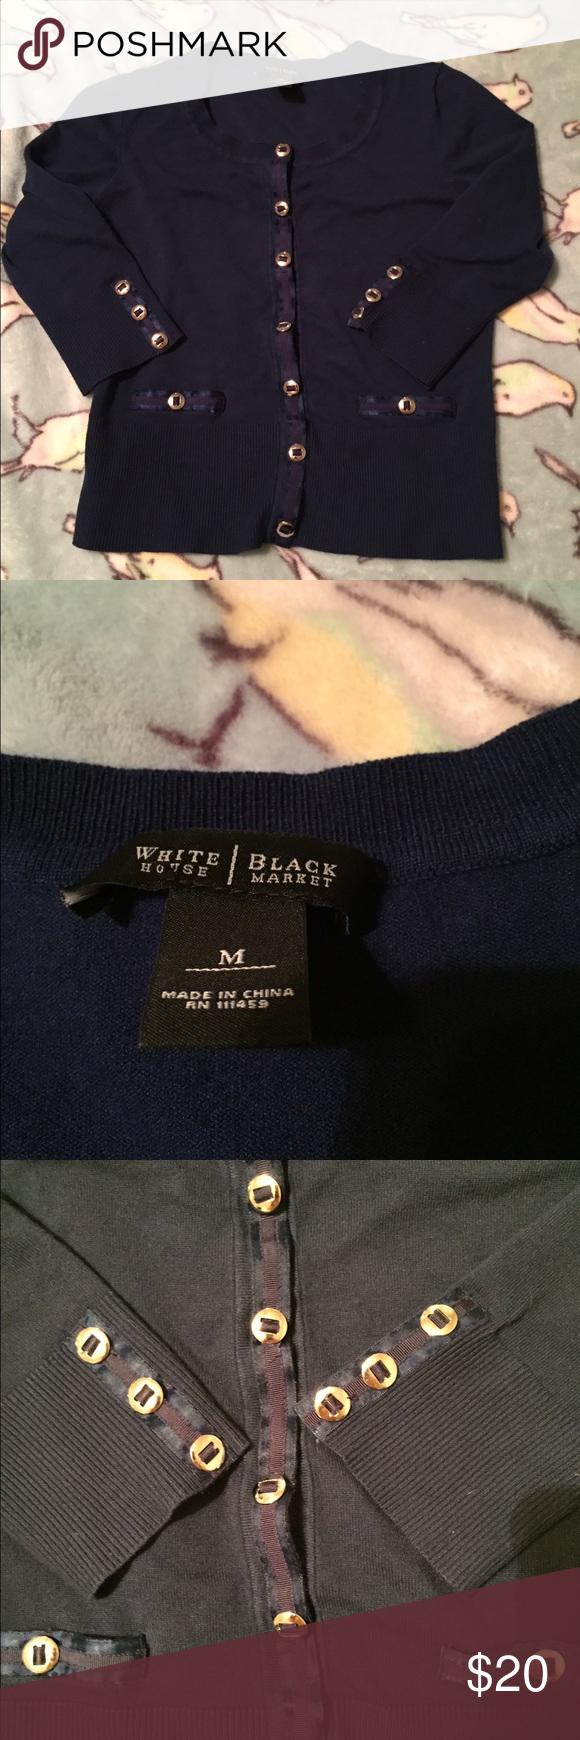 White House Black Market cardigan Navy blue, Sz M, 3/4 sleeves White House Black Market Sweaters Cardigans